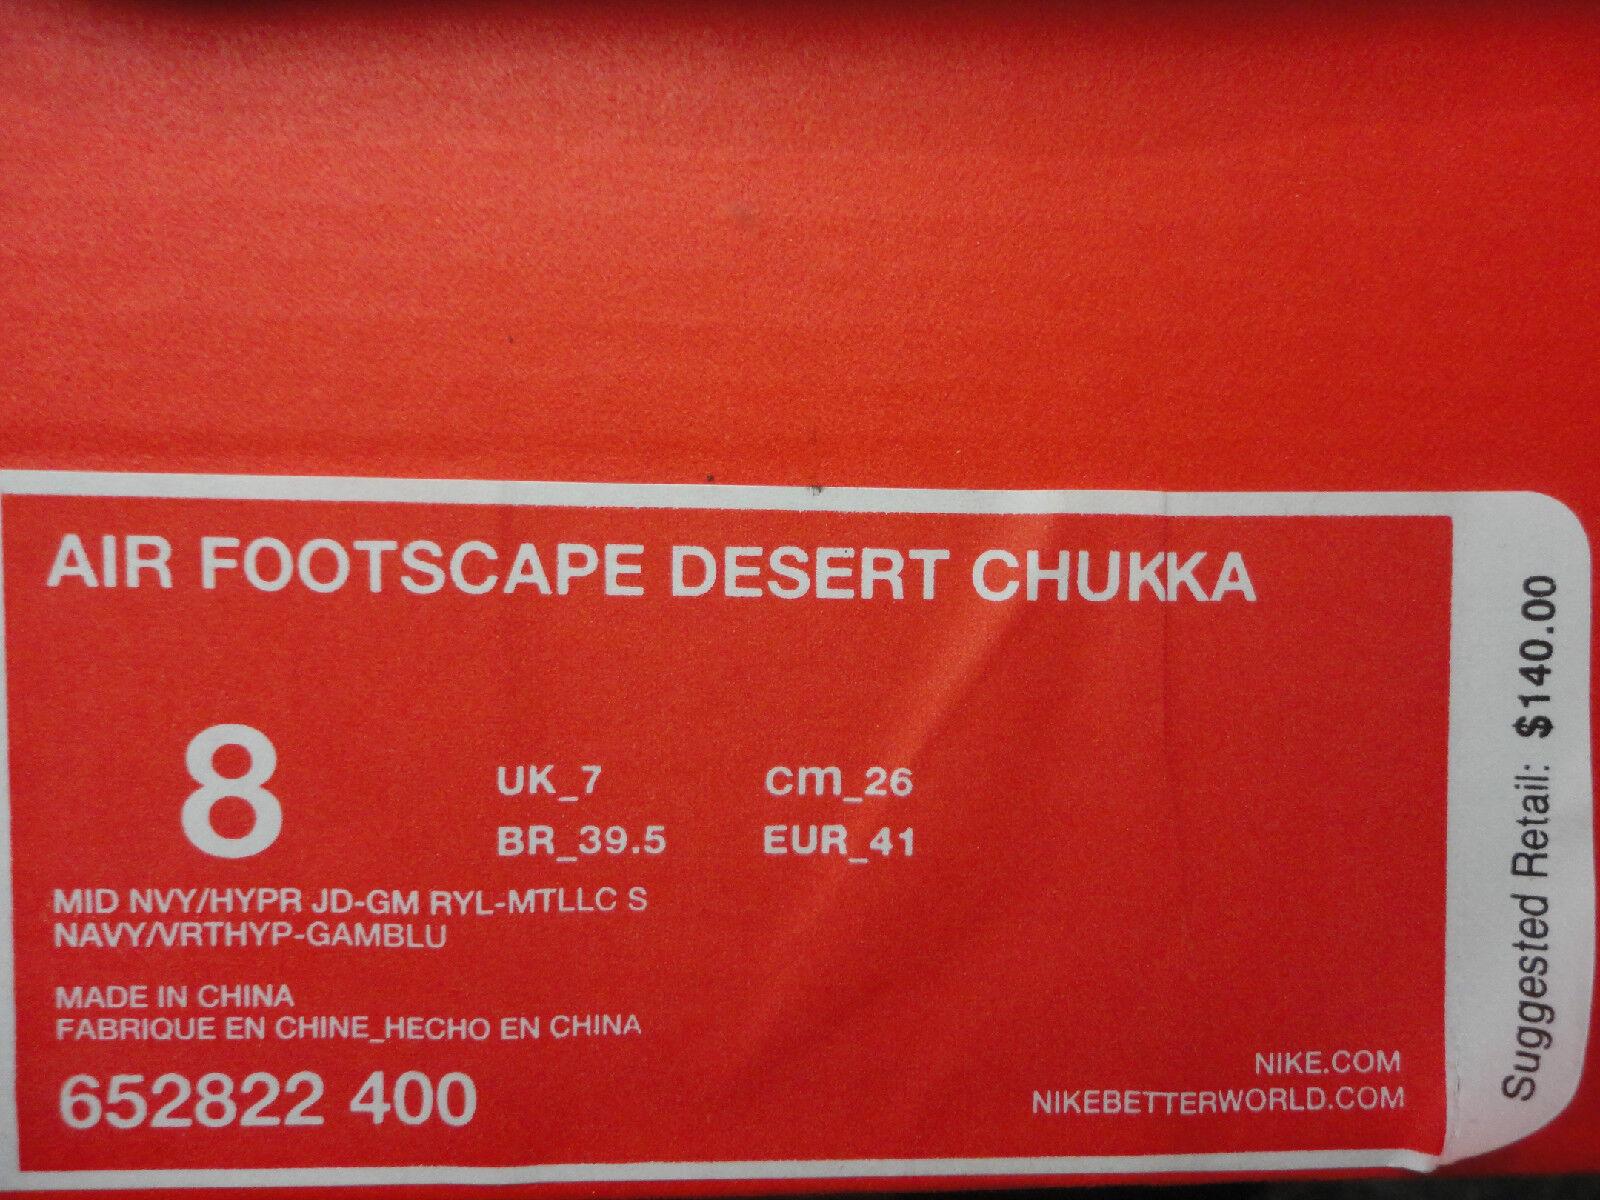 Nike Air Footscape Desert Chukka, Navy     Hyper Jade   Silver, Woven, Size 8 b9a1e3